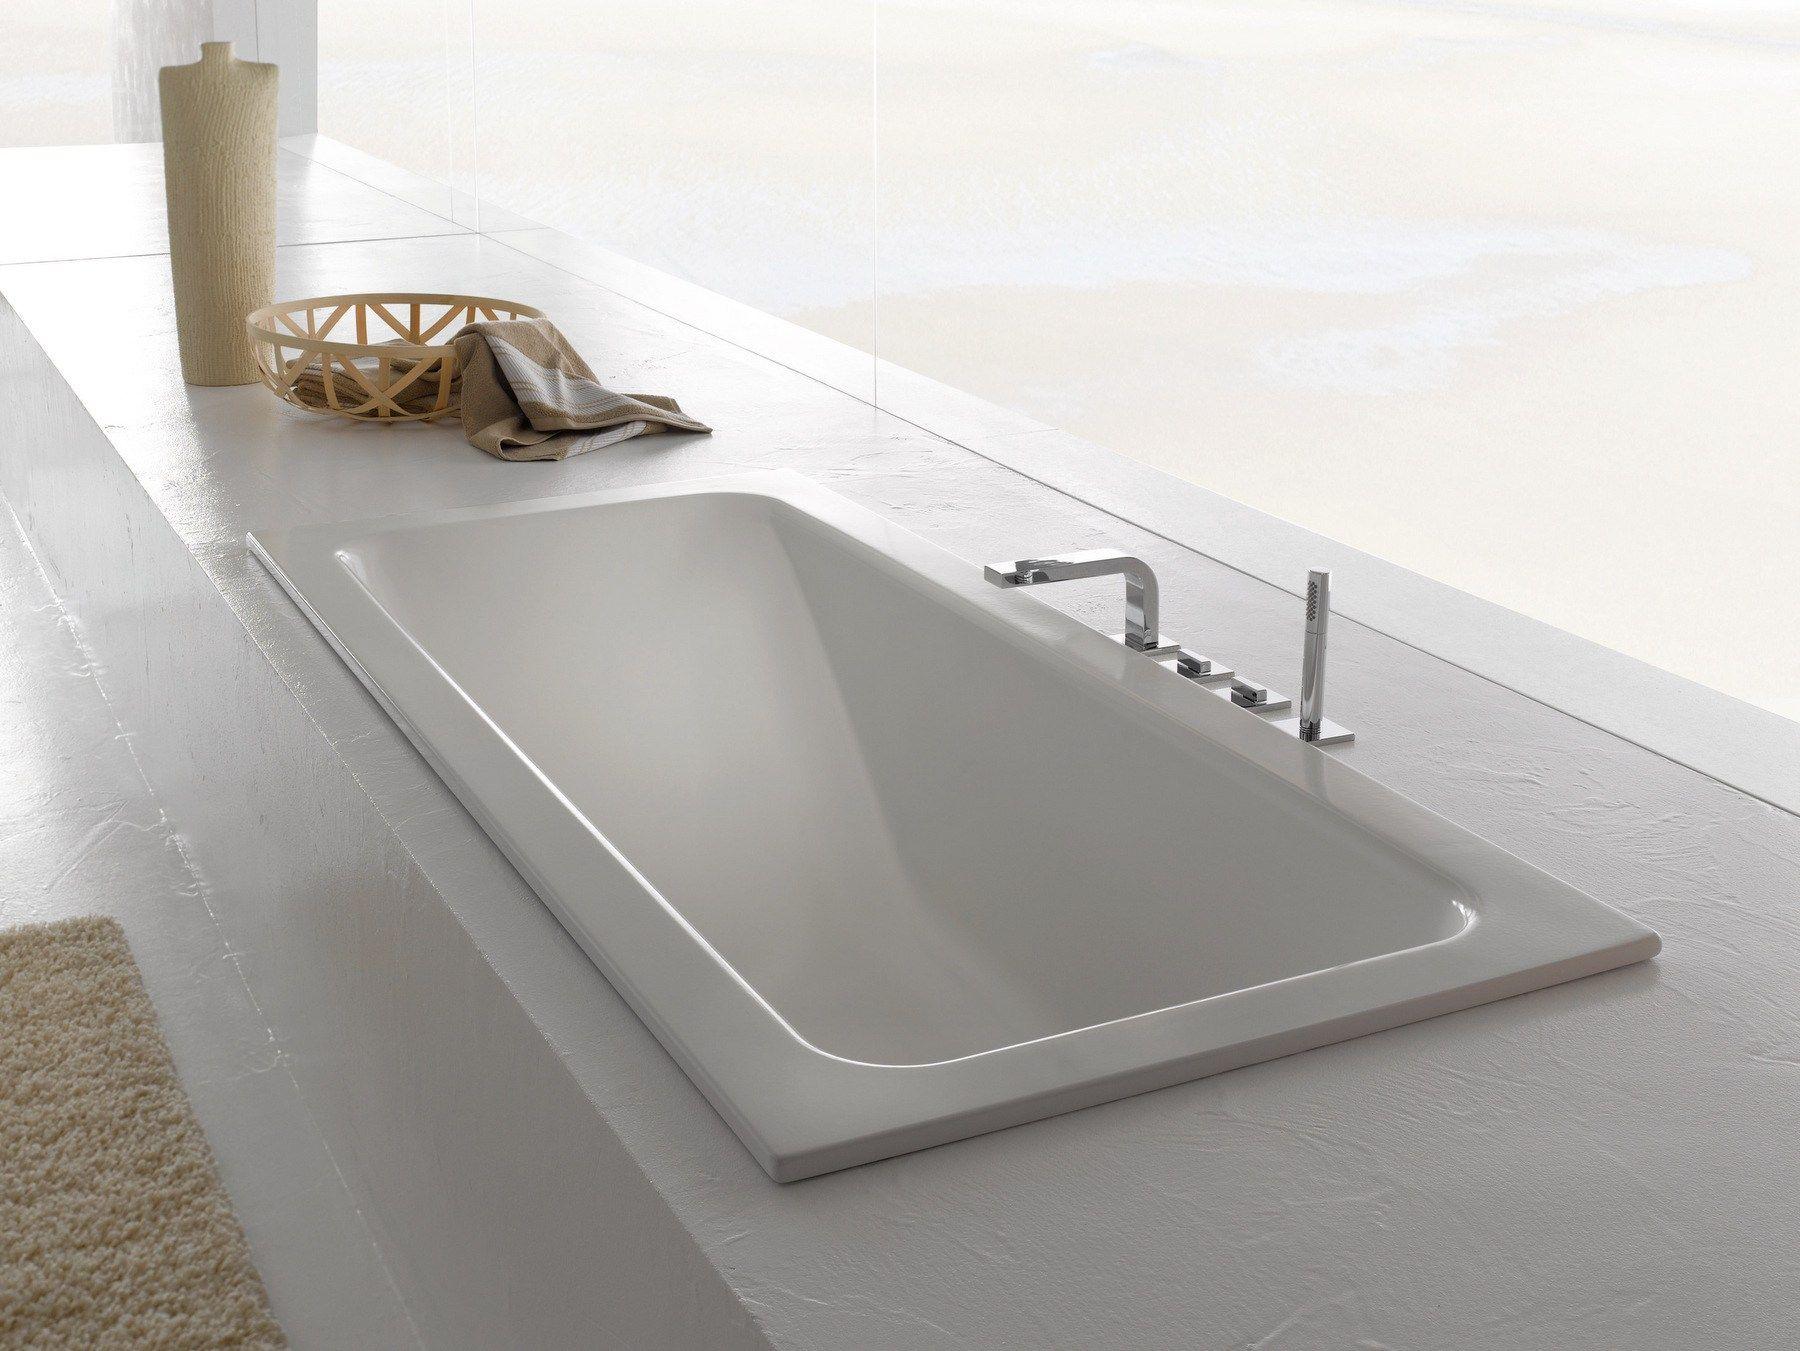 baignoire rectangulaire encastrable betteone relax by bette design tesseraux partner. Black Bedroom Furniture Sets. Home Design Ideas